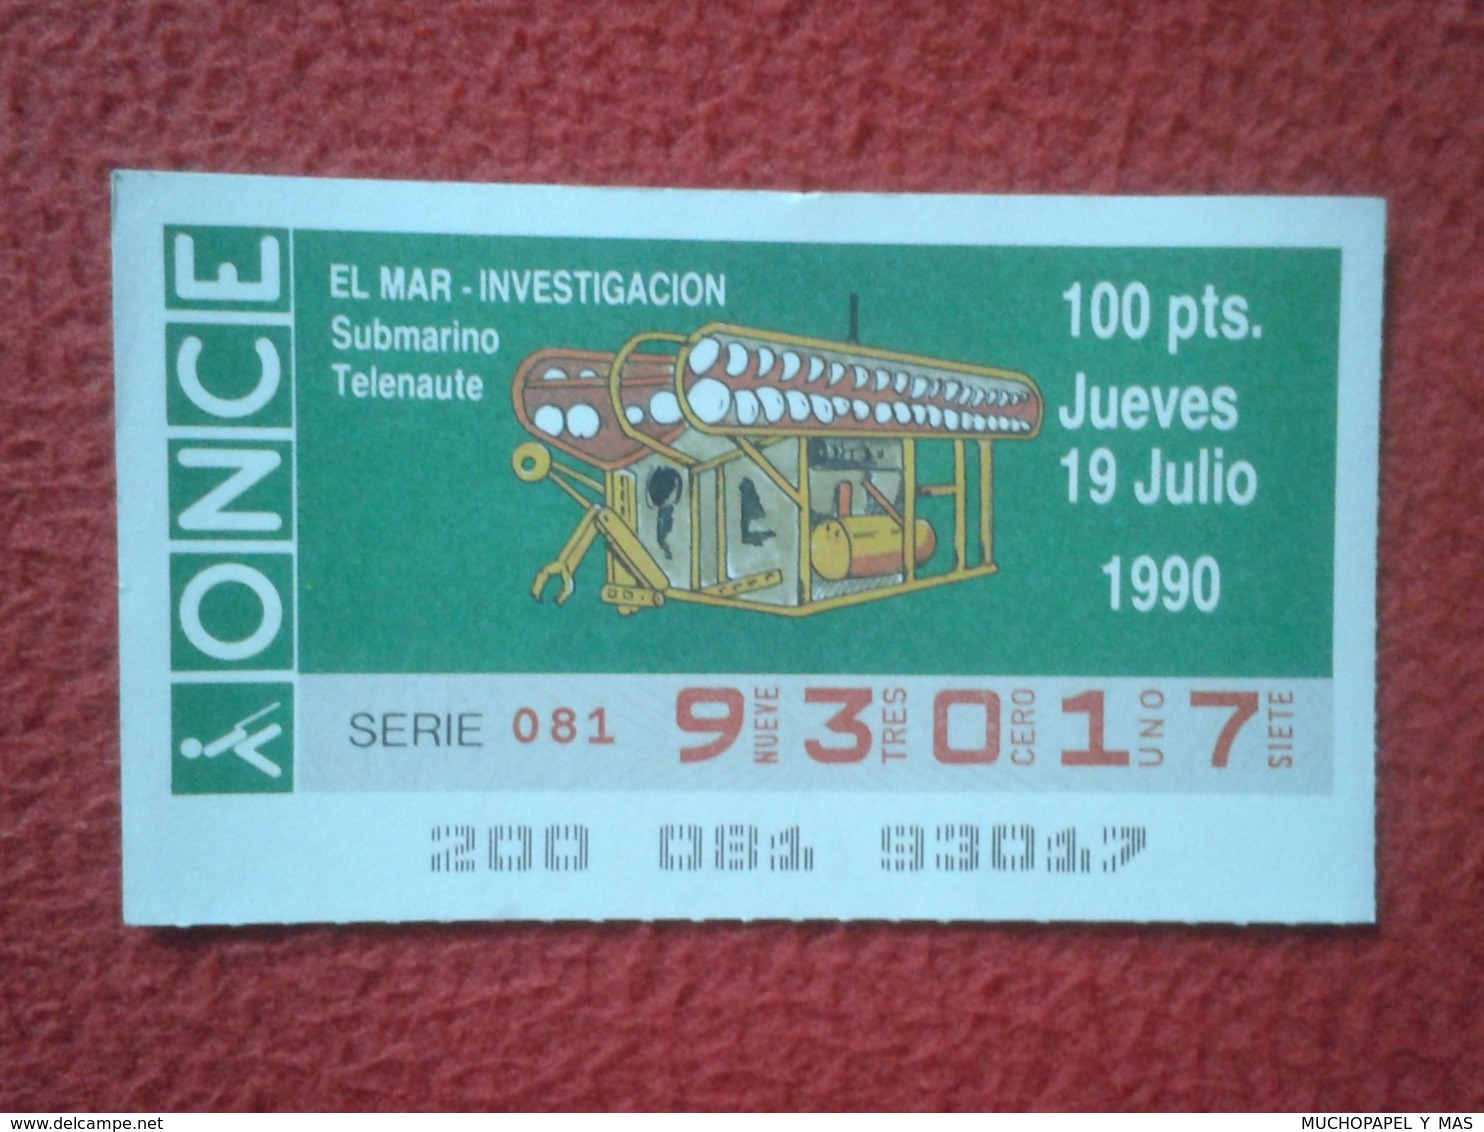 CUPÓN DE ONCE LOTTERY SPAIN LOTERÍA ESPAÑA ESPAGNE EL MAR THE SEA LA MER 1990 SUBMARINO SUBMARINE SOUS MARIN TELENAUTE.. - Billetes De Lotería